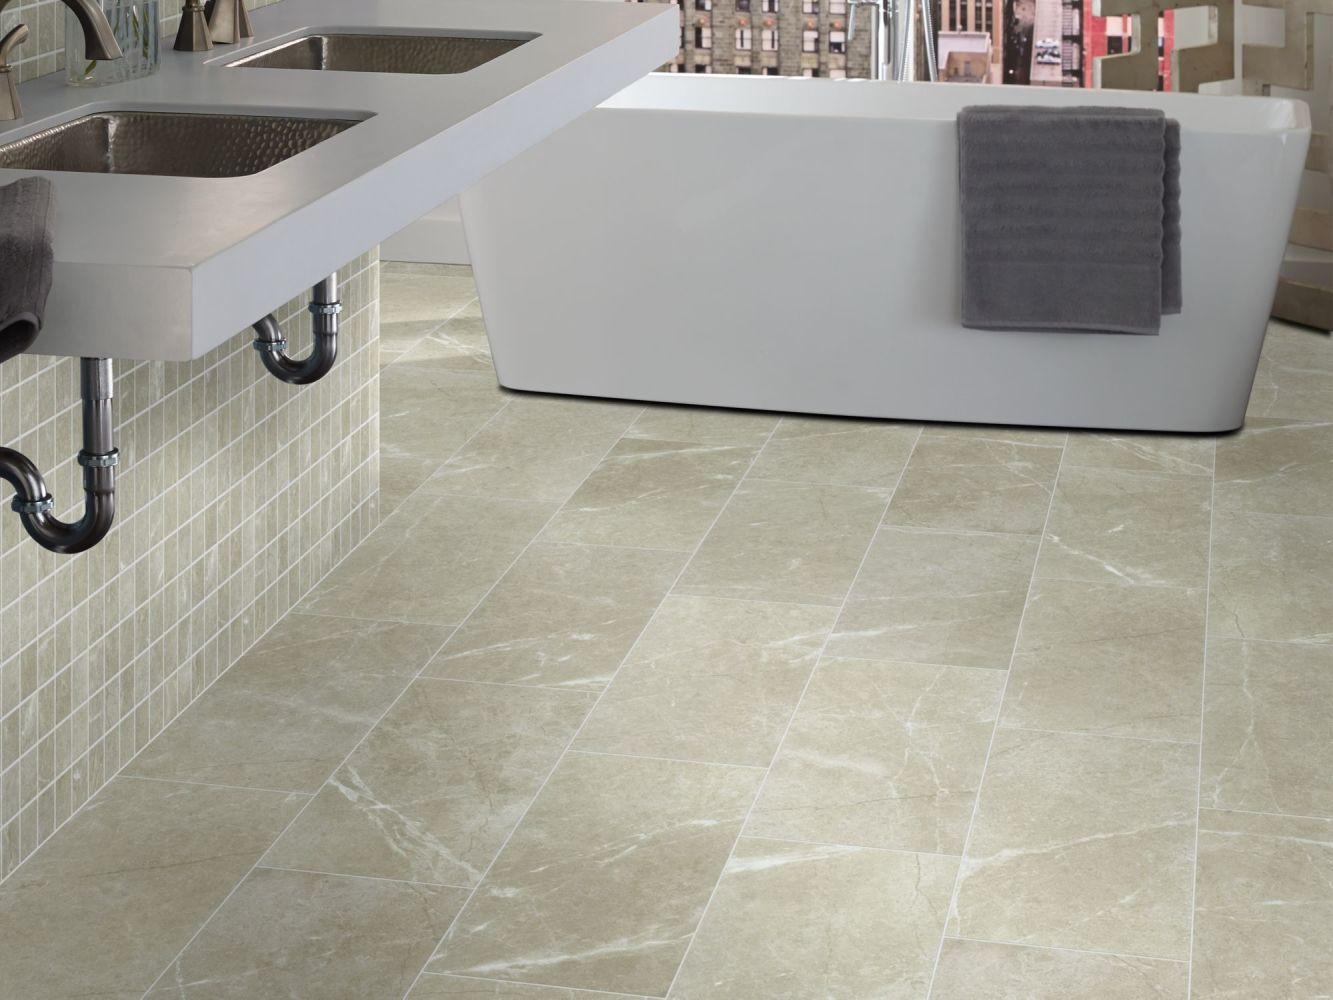 Shaw Floors Home Fn Gold Ceramic Illusion 12×24 Oasis 00501_TG64B